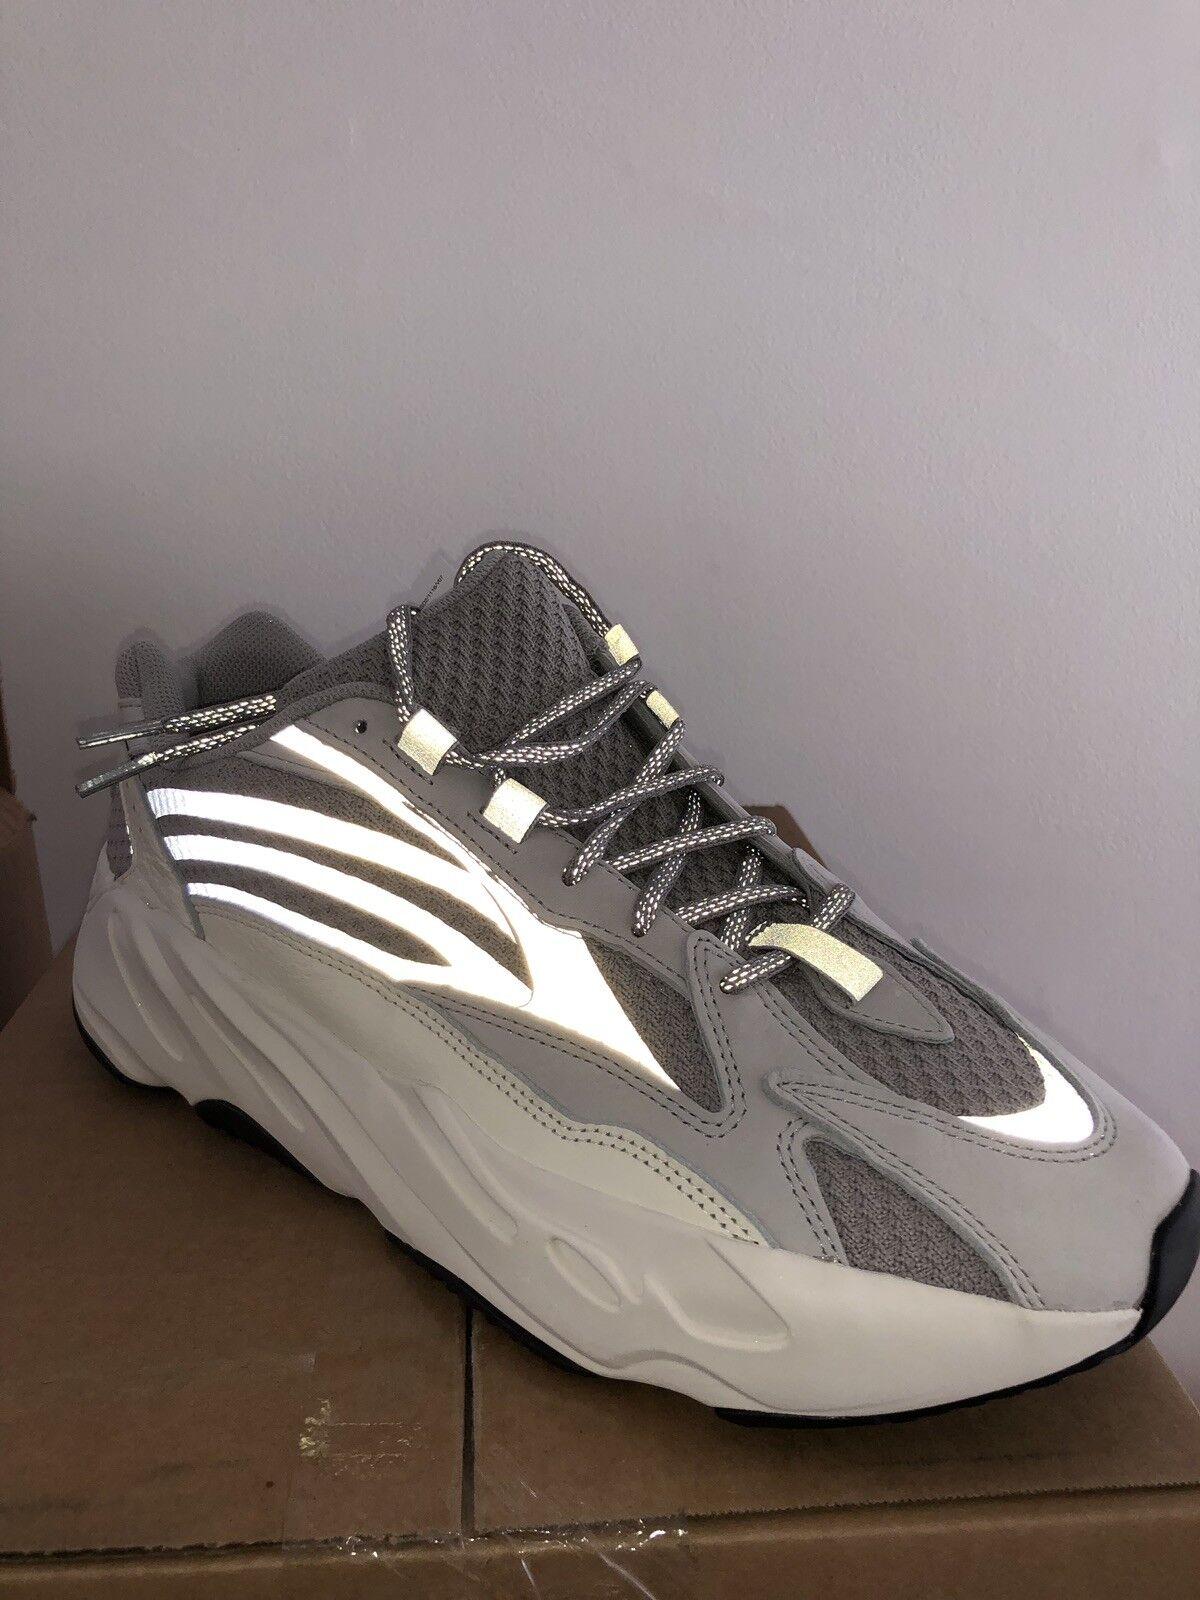 Adidas Yeezy 700 V2 Static - Sz 12